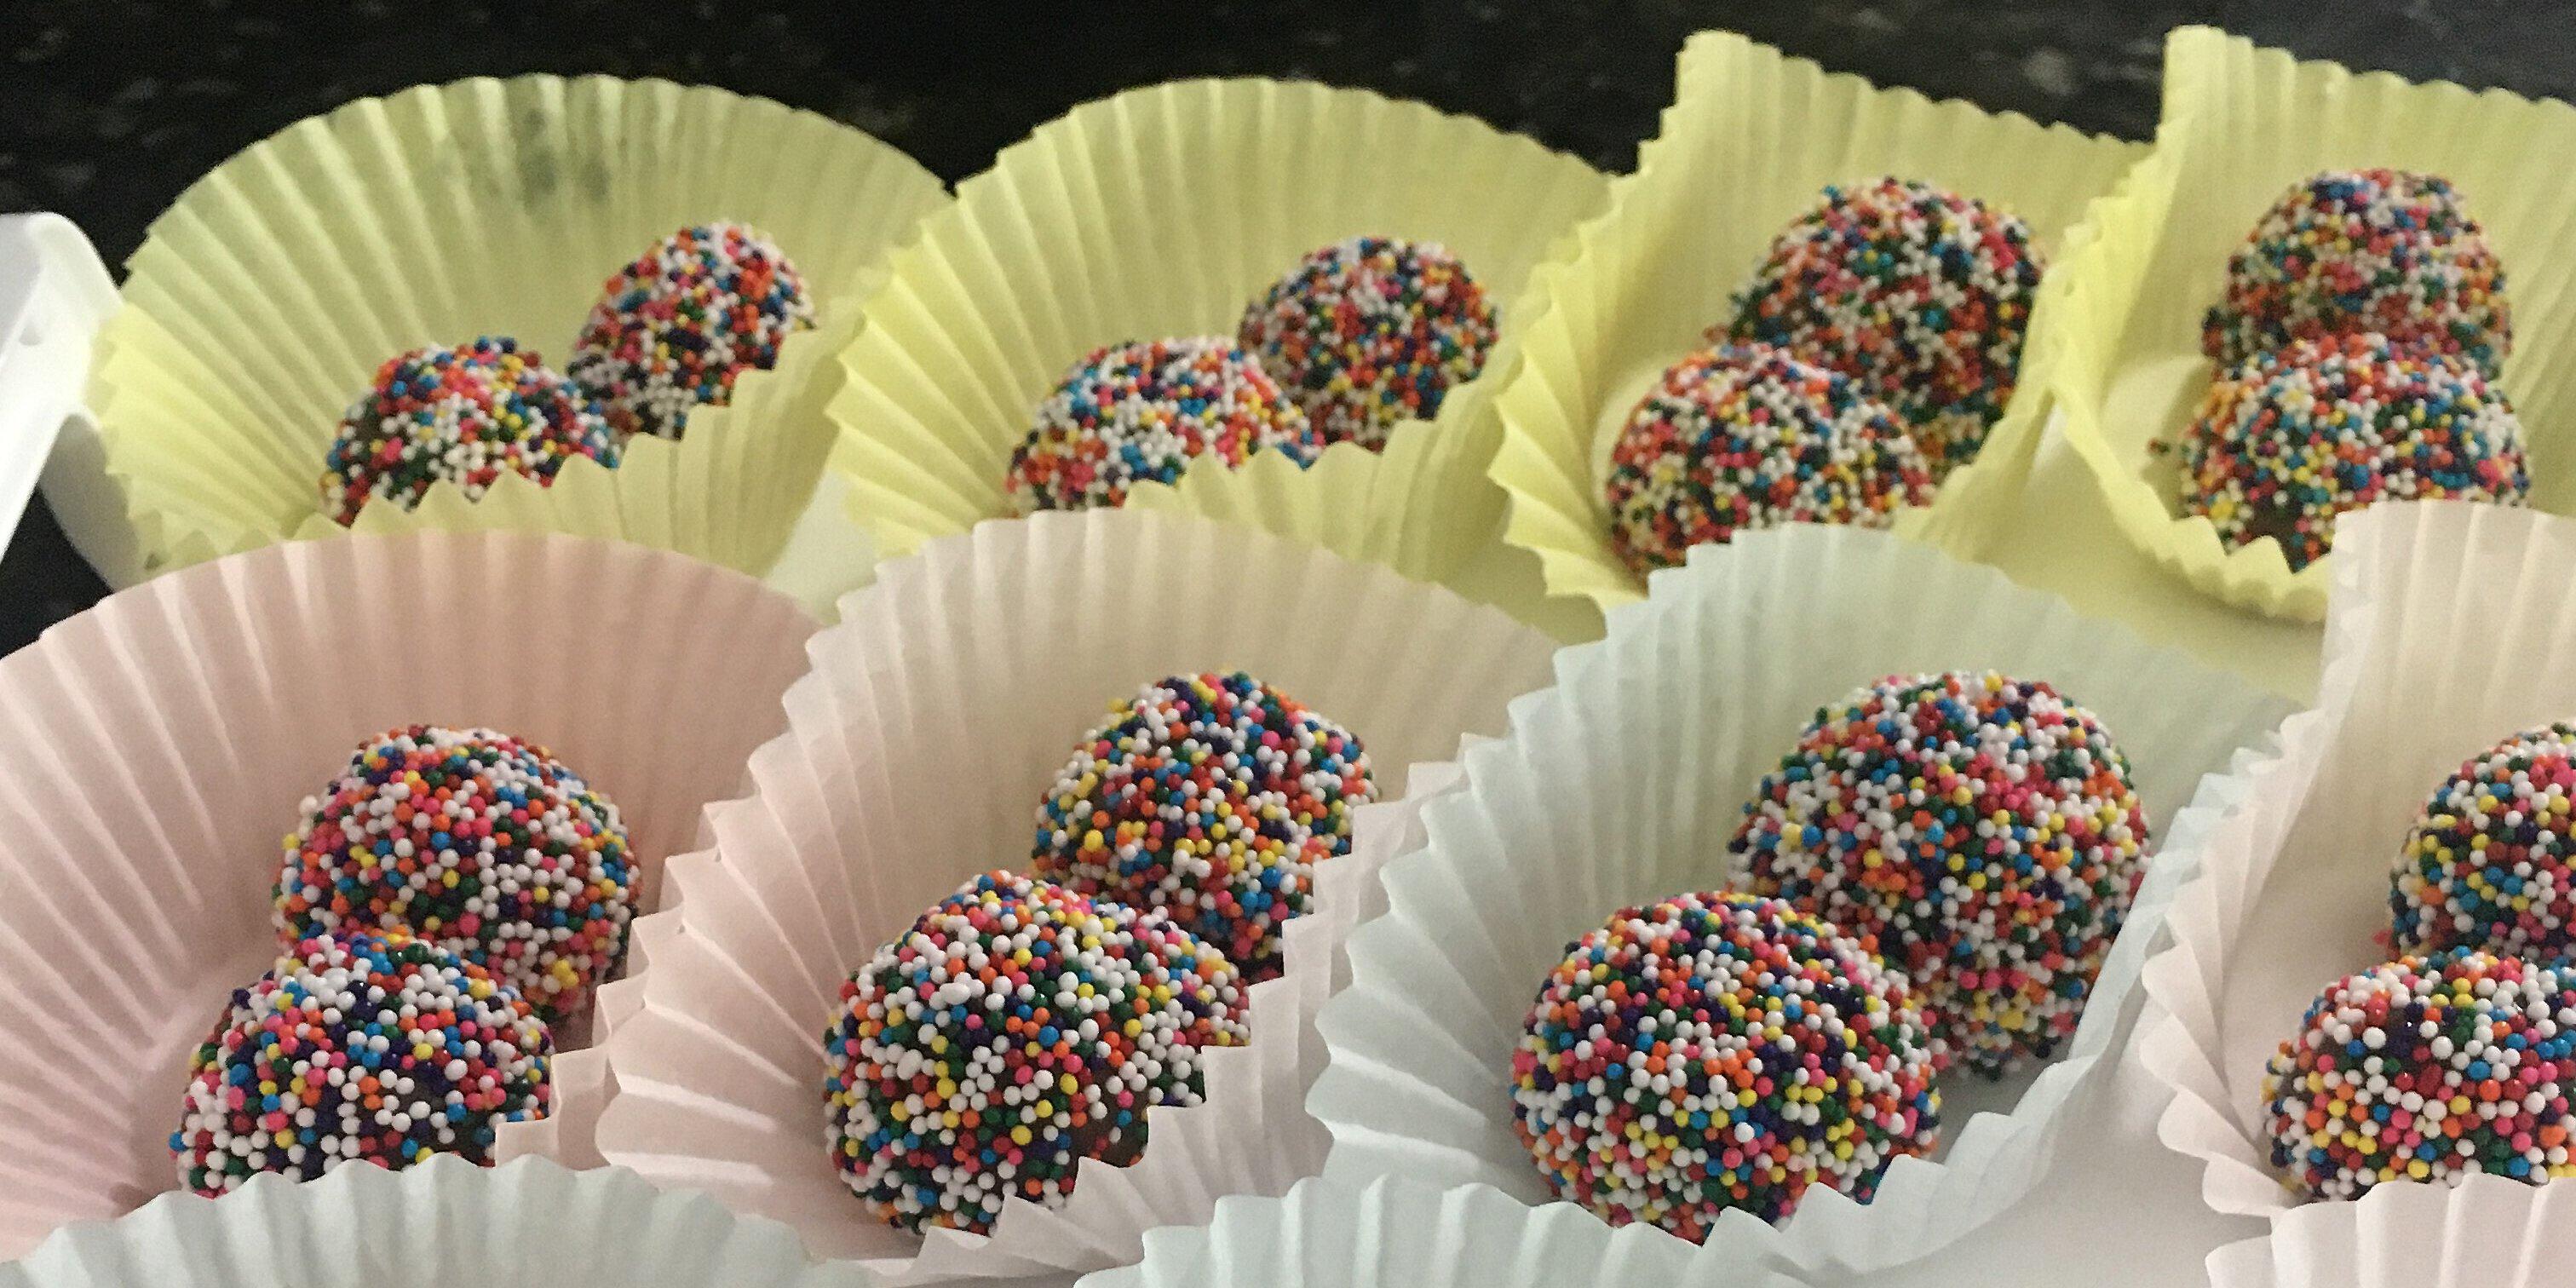 brigadeiro chocolate delights recipe